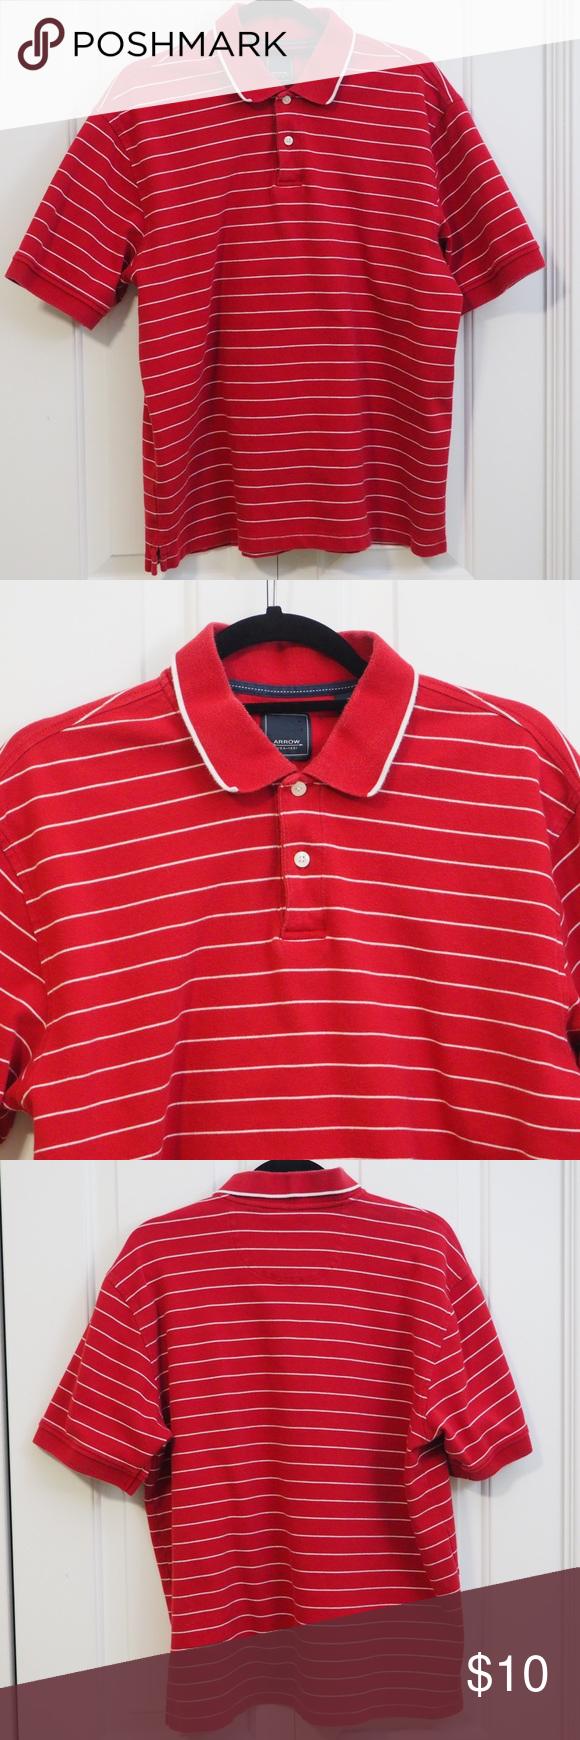 Arrow Striped Polo Shirt Red White Collar Button Striped Polo Shirt Business Casual Work Work Casual